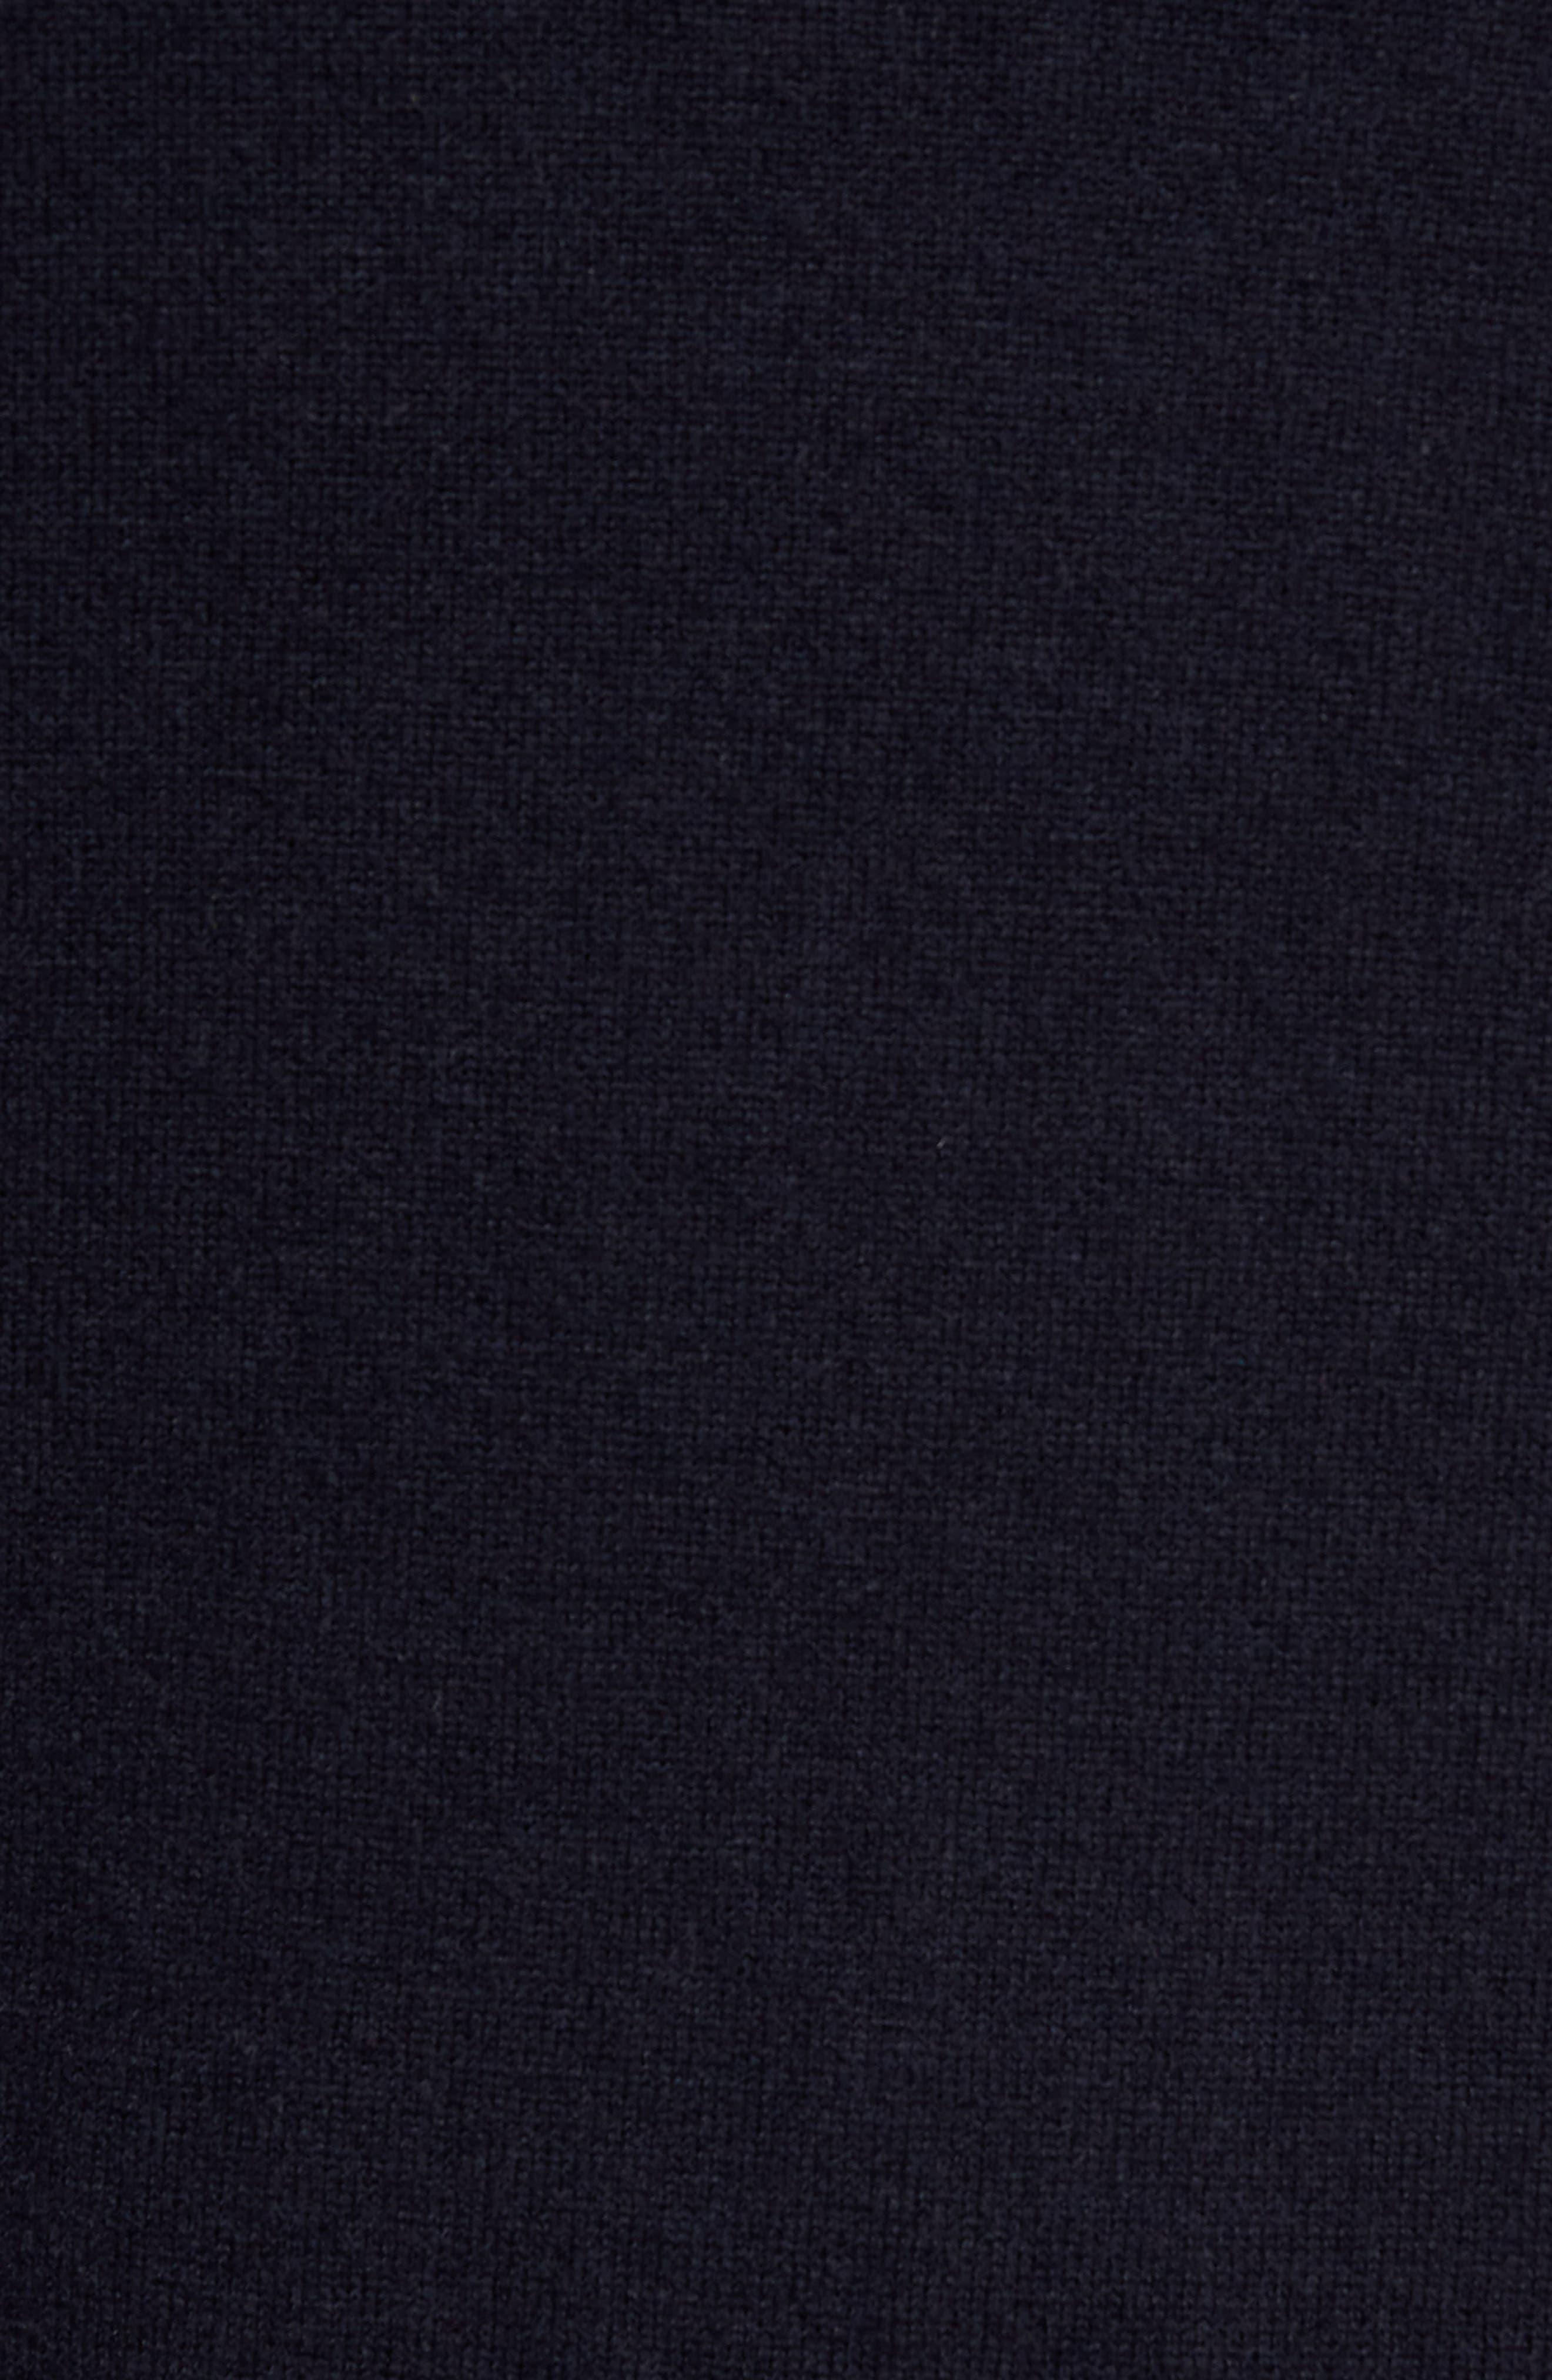 Merino Wool Baseball Sweater,                             Alternate thumbnail 5, color,                             Navy